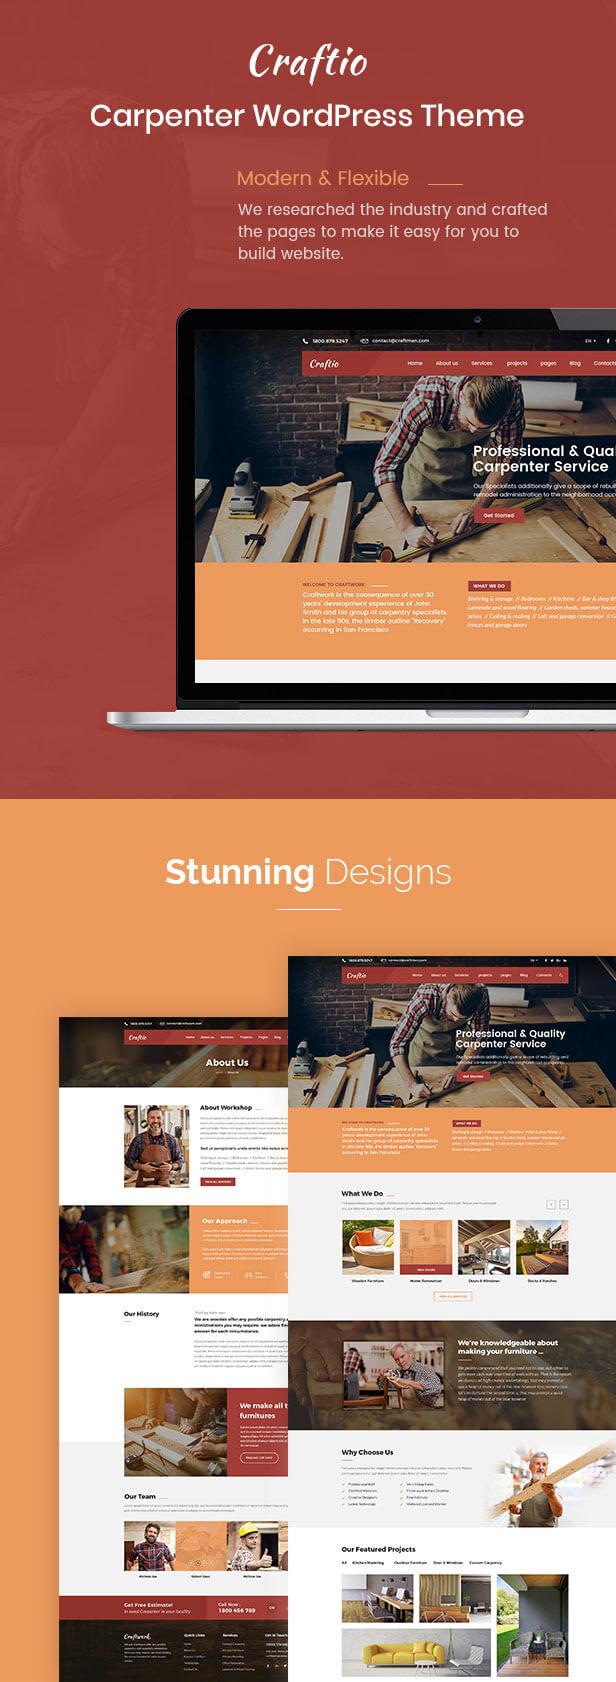 Craftio - Carpenter WordPress Theme - 2